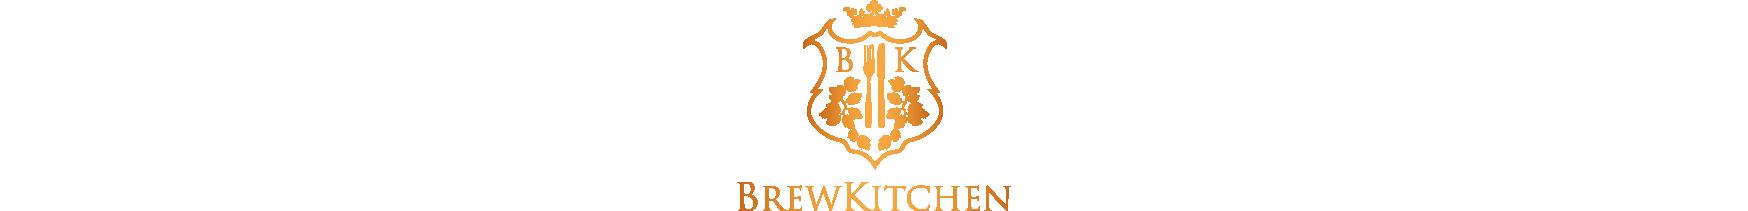 Brewkitchen.png